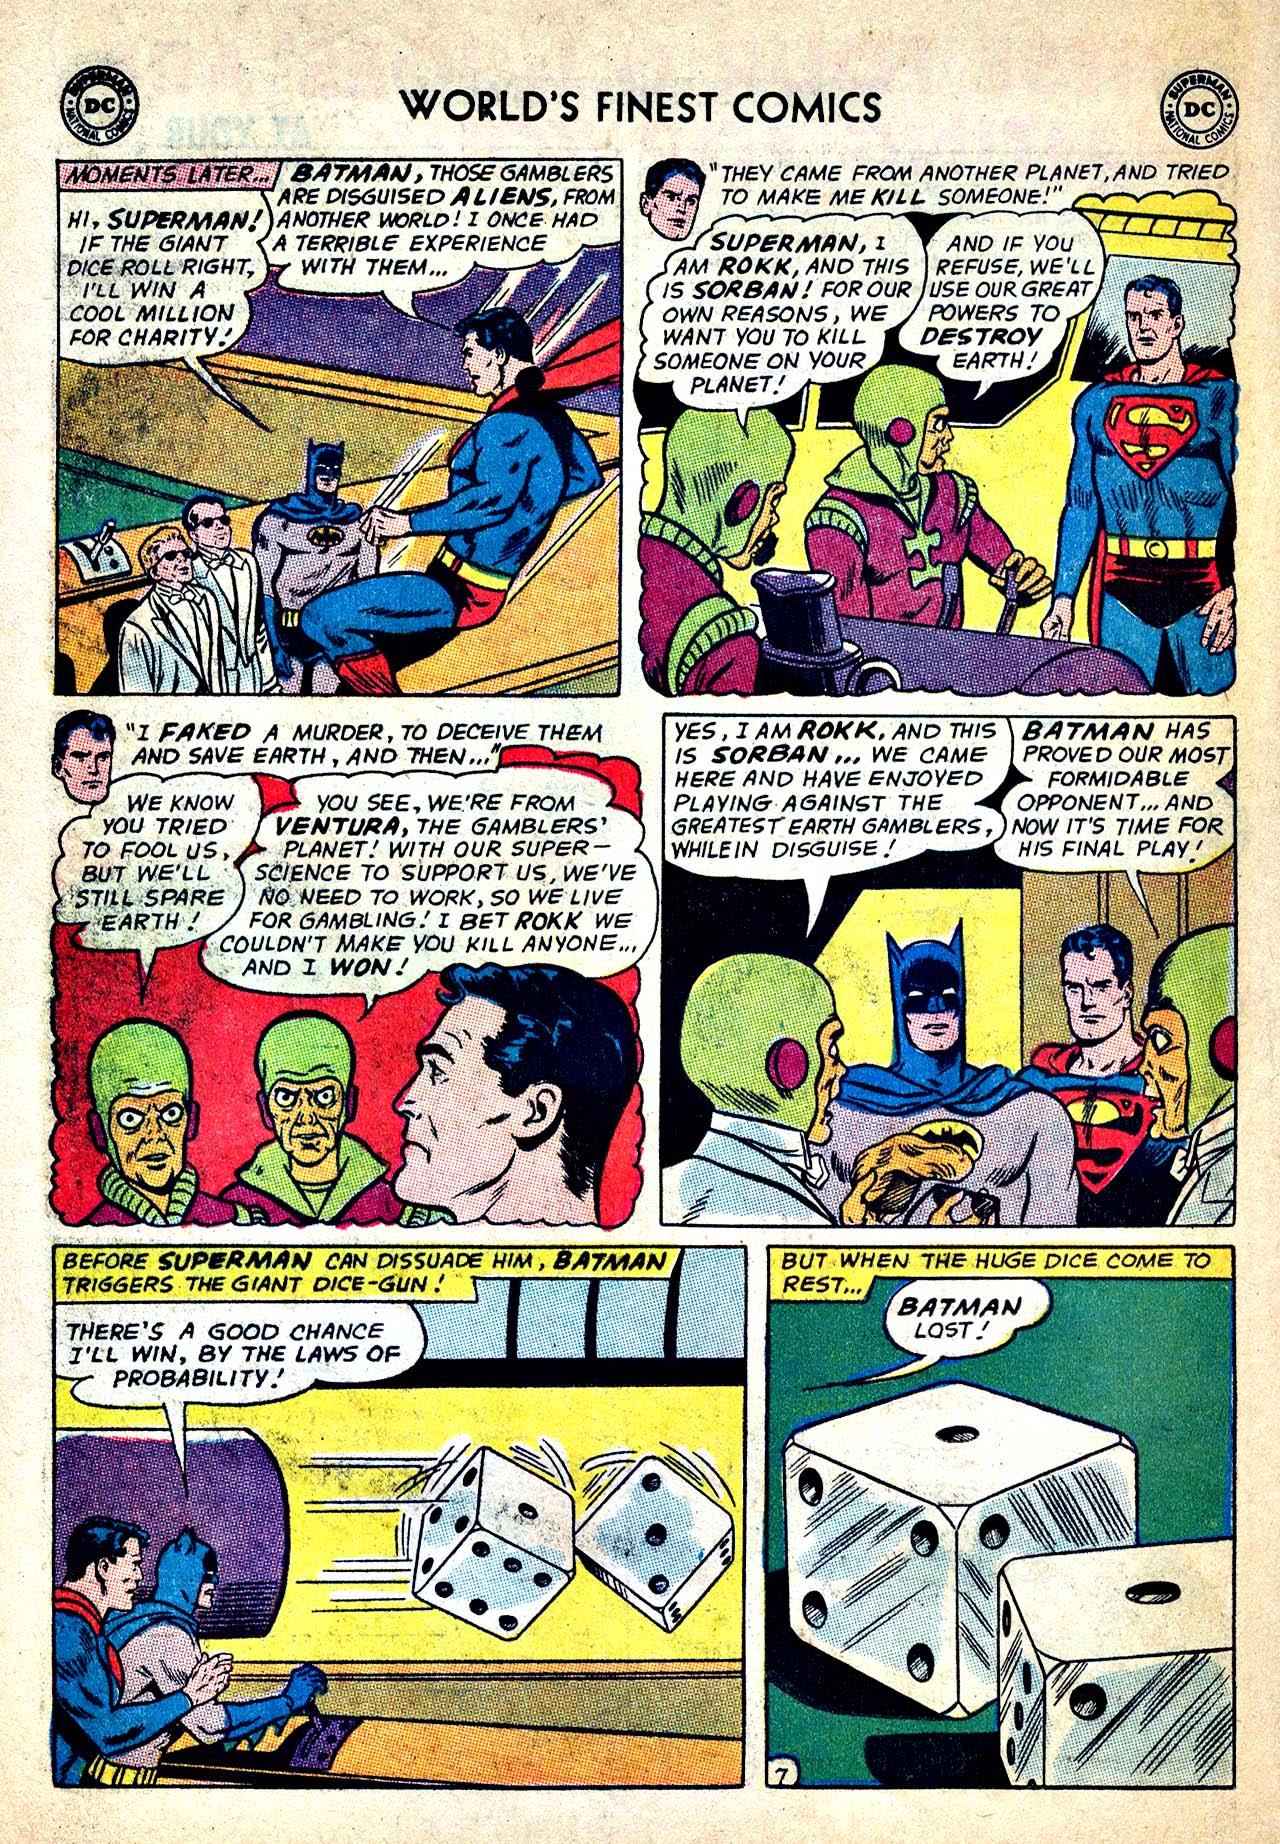 Read online World's Finest Comics comic -  Issue #150 - 10